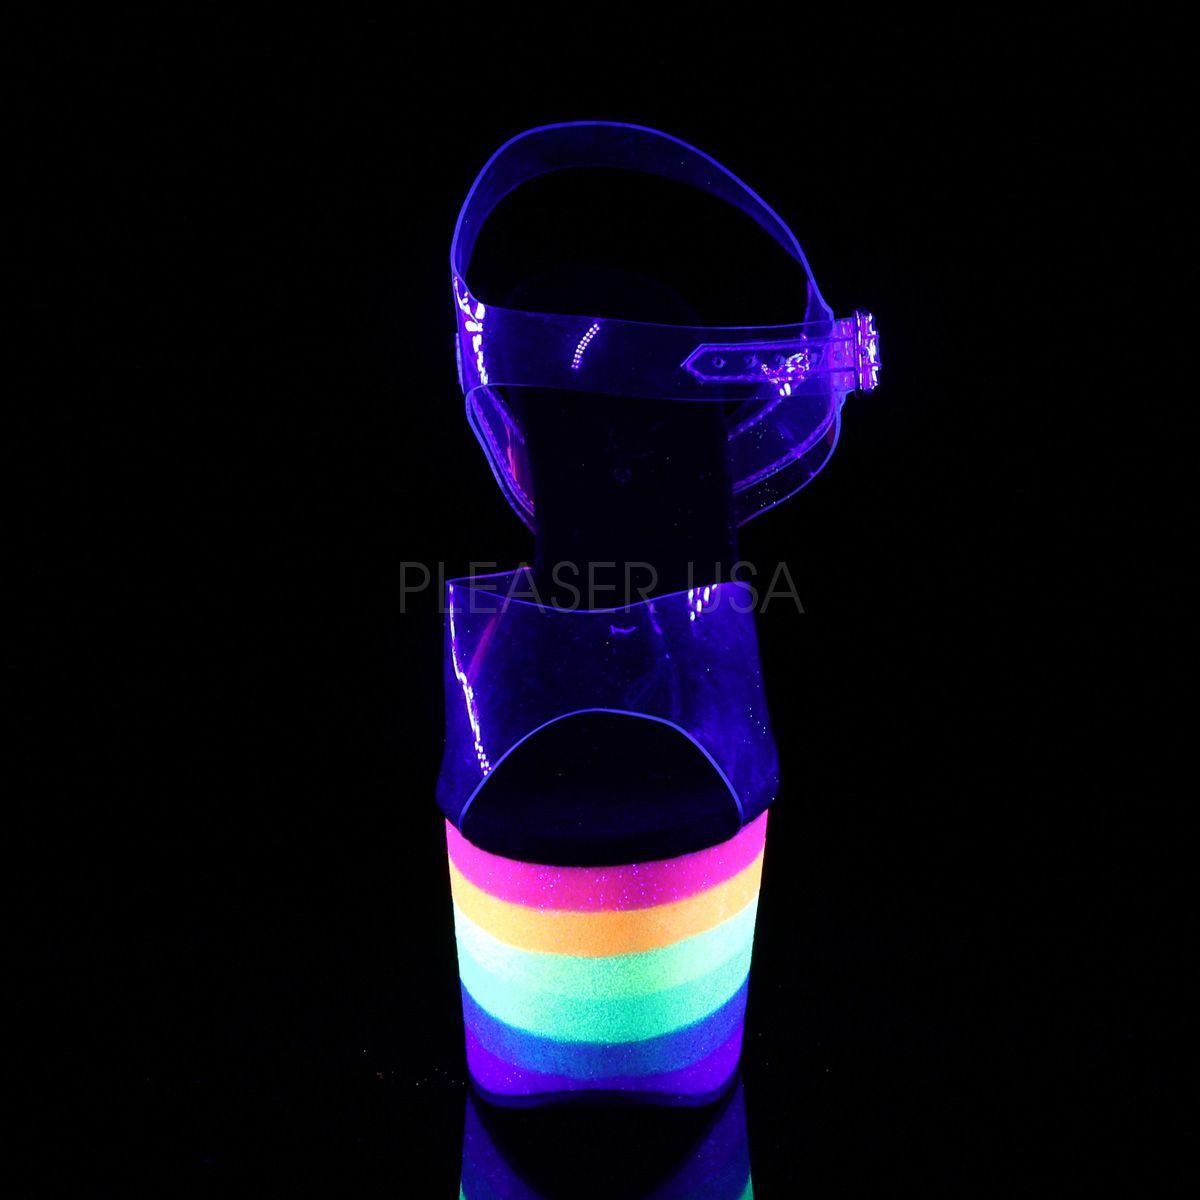 Sandália Adore 708 UV Rainbow Glitter - Pleaser (encomenda)